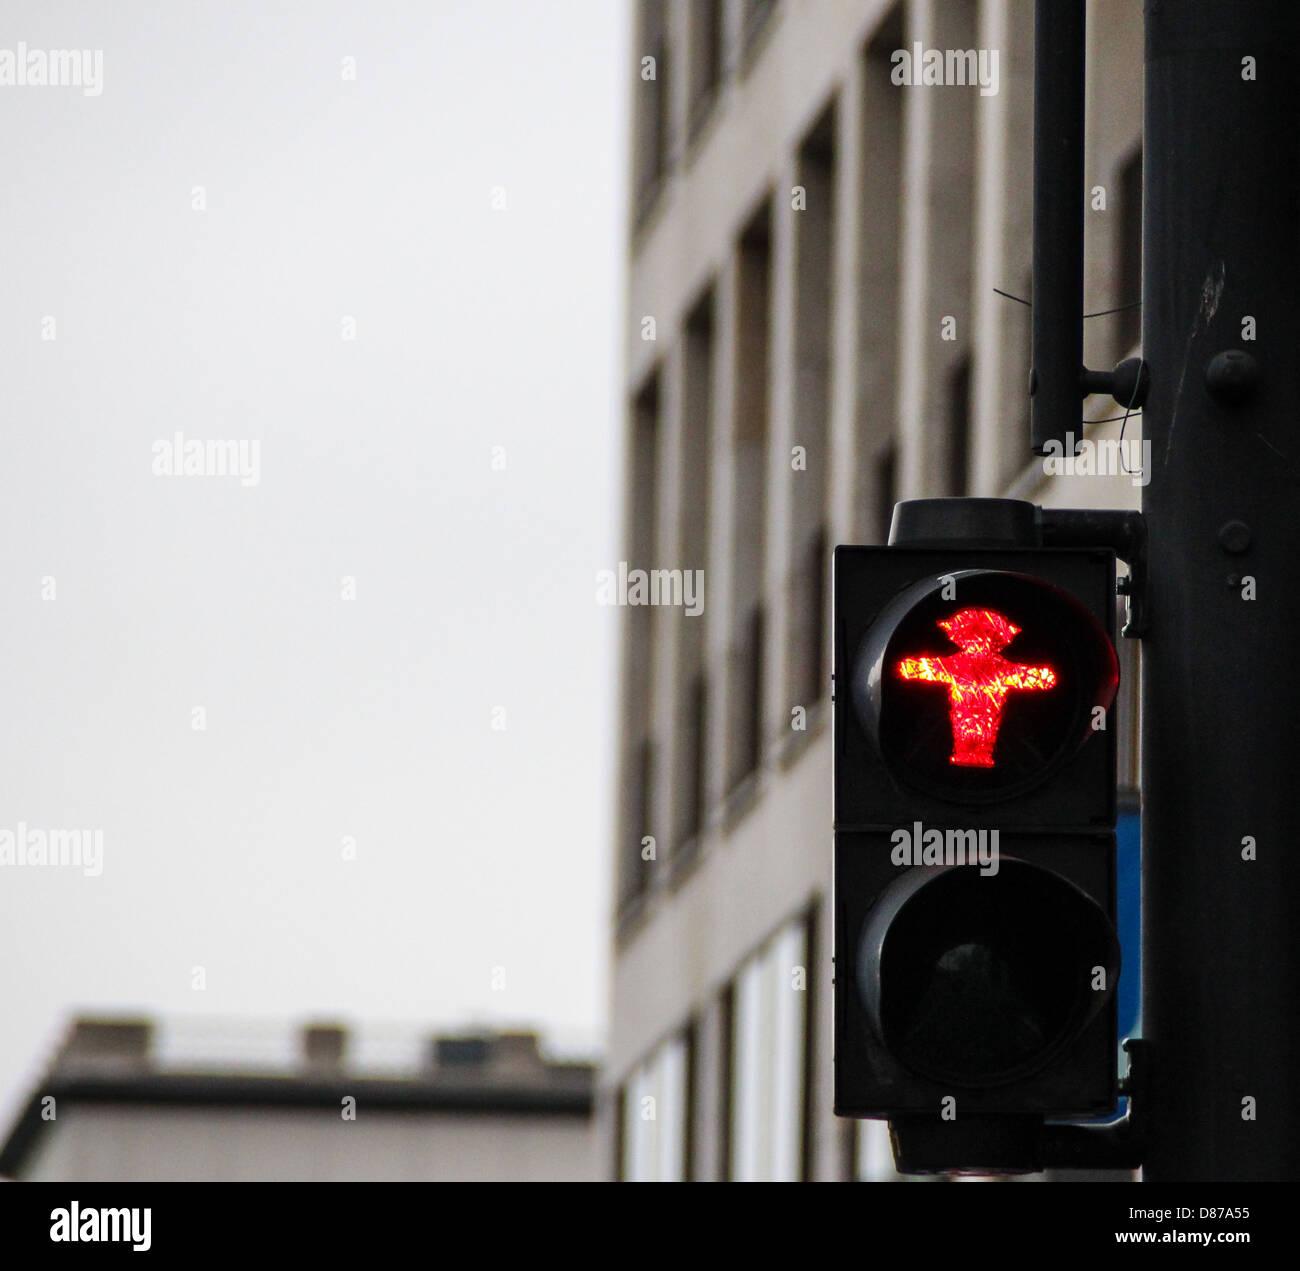 Little Traffic Light Man Stock Photos Trafficsignallightcontroldiagram3 Pedestrian Lights In Berlin With The Traditional Red Ampelmann Symbol Of